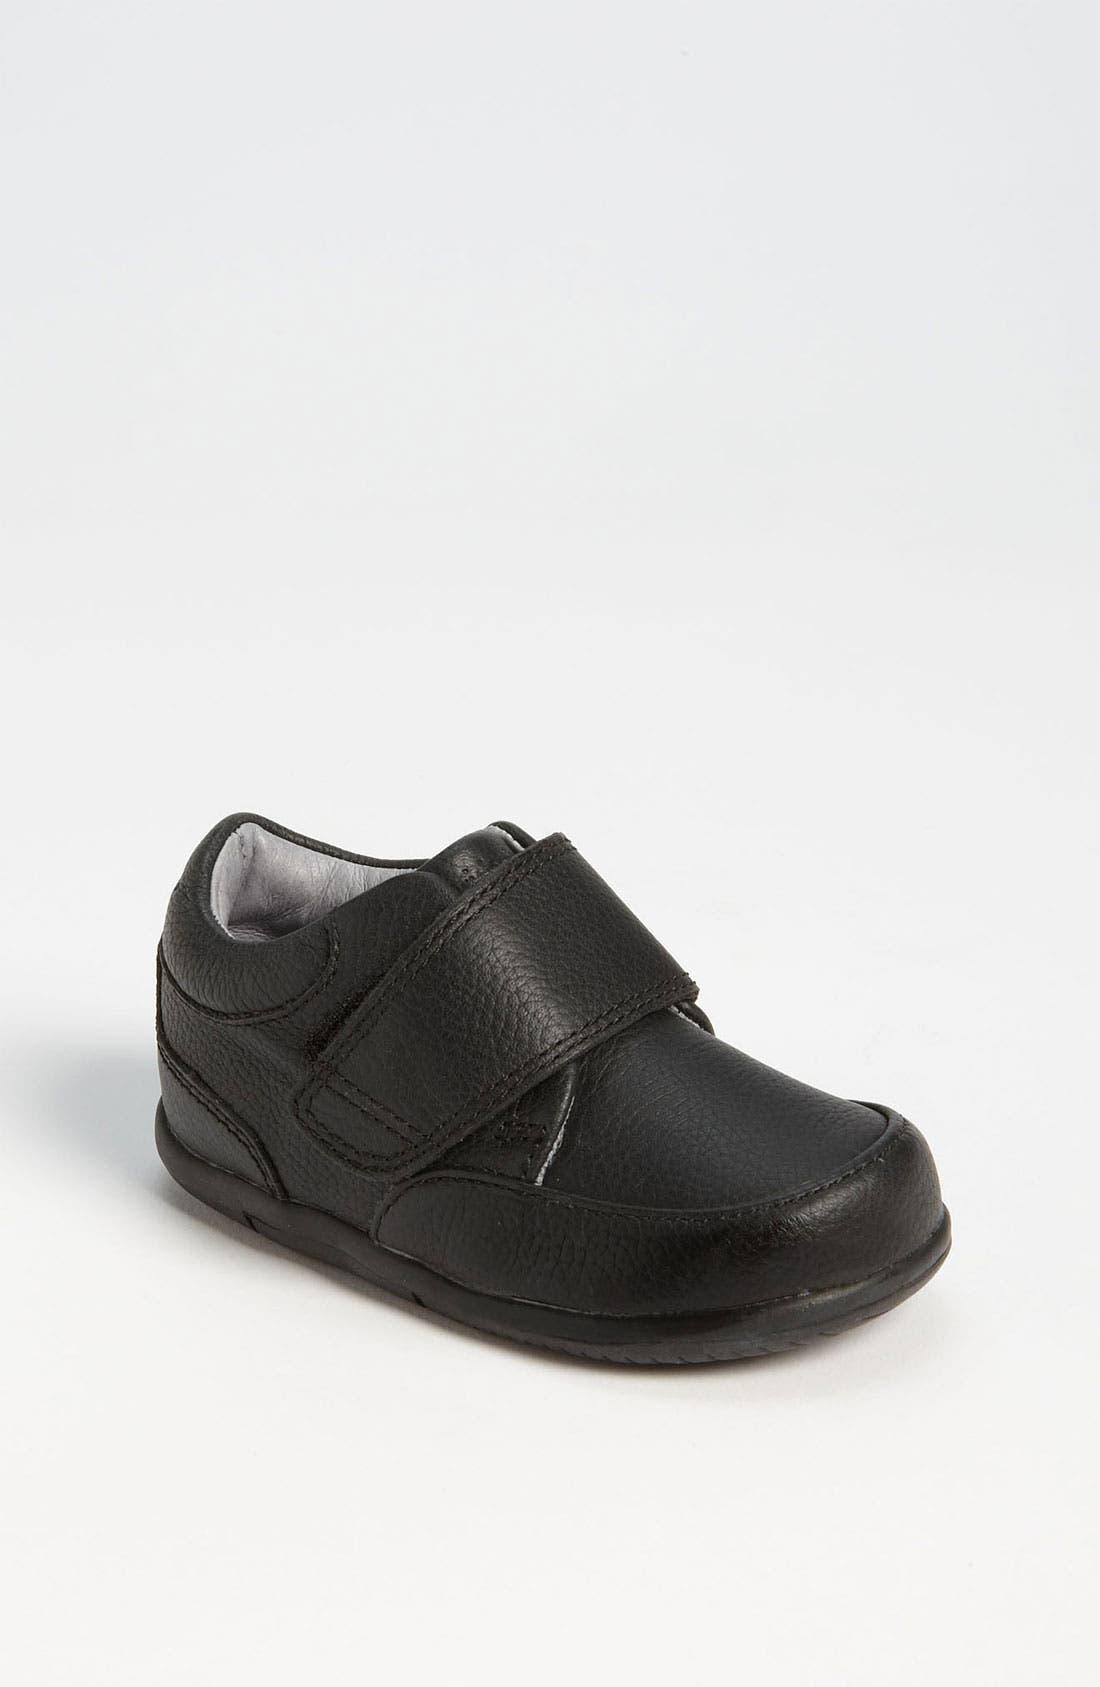 Main Image - Stride Rite 'Ross' Dress Shoe (Baby, Walker & Toddler)